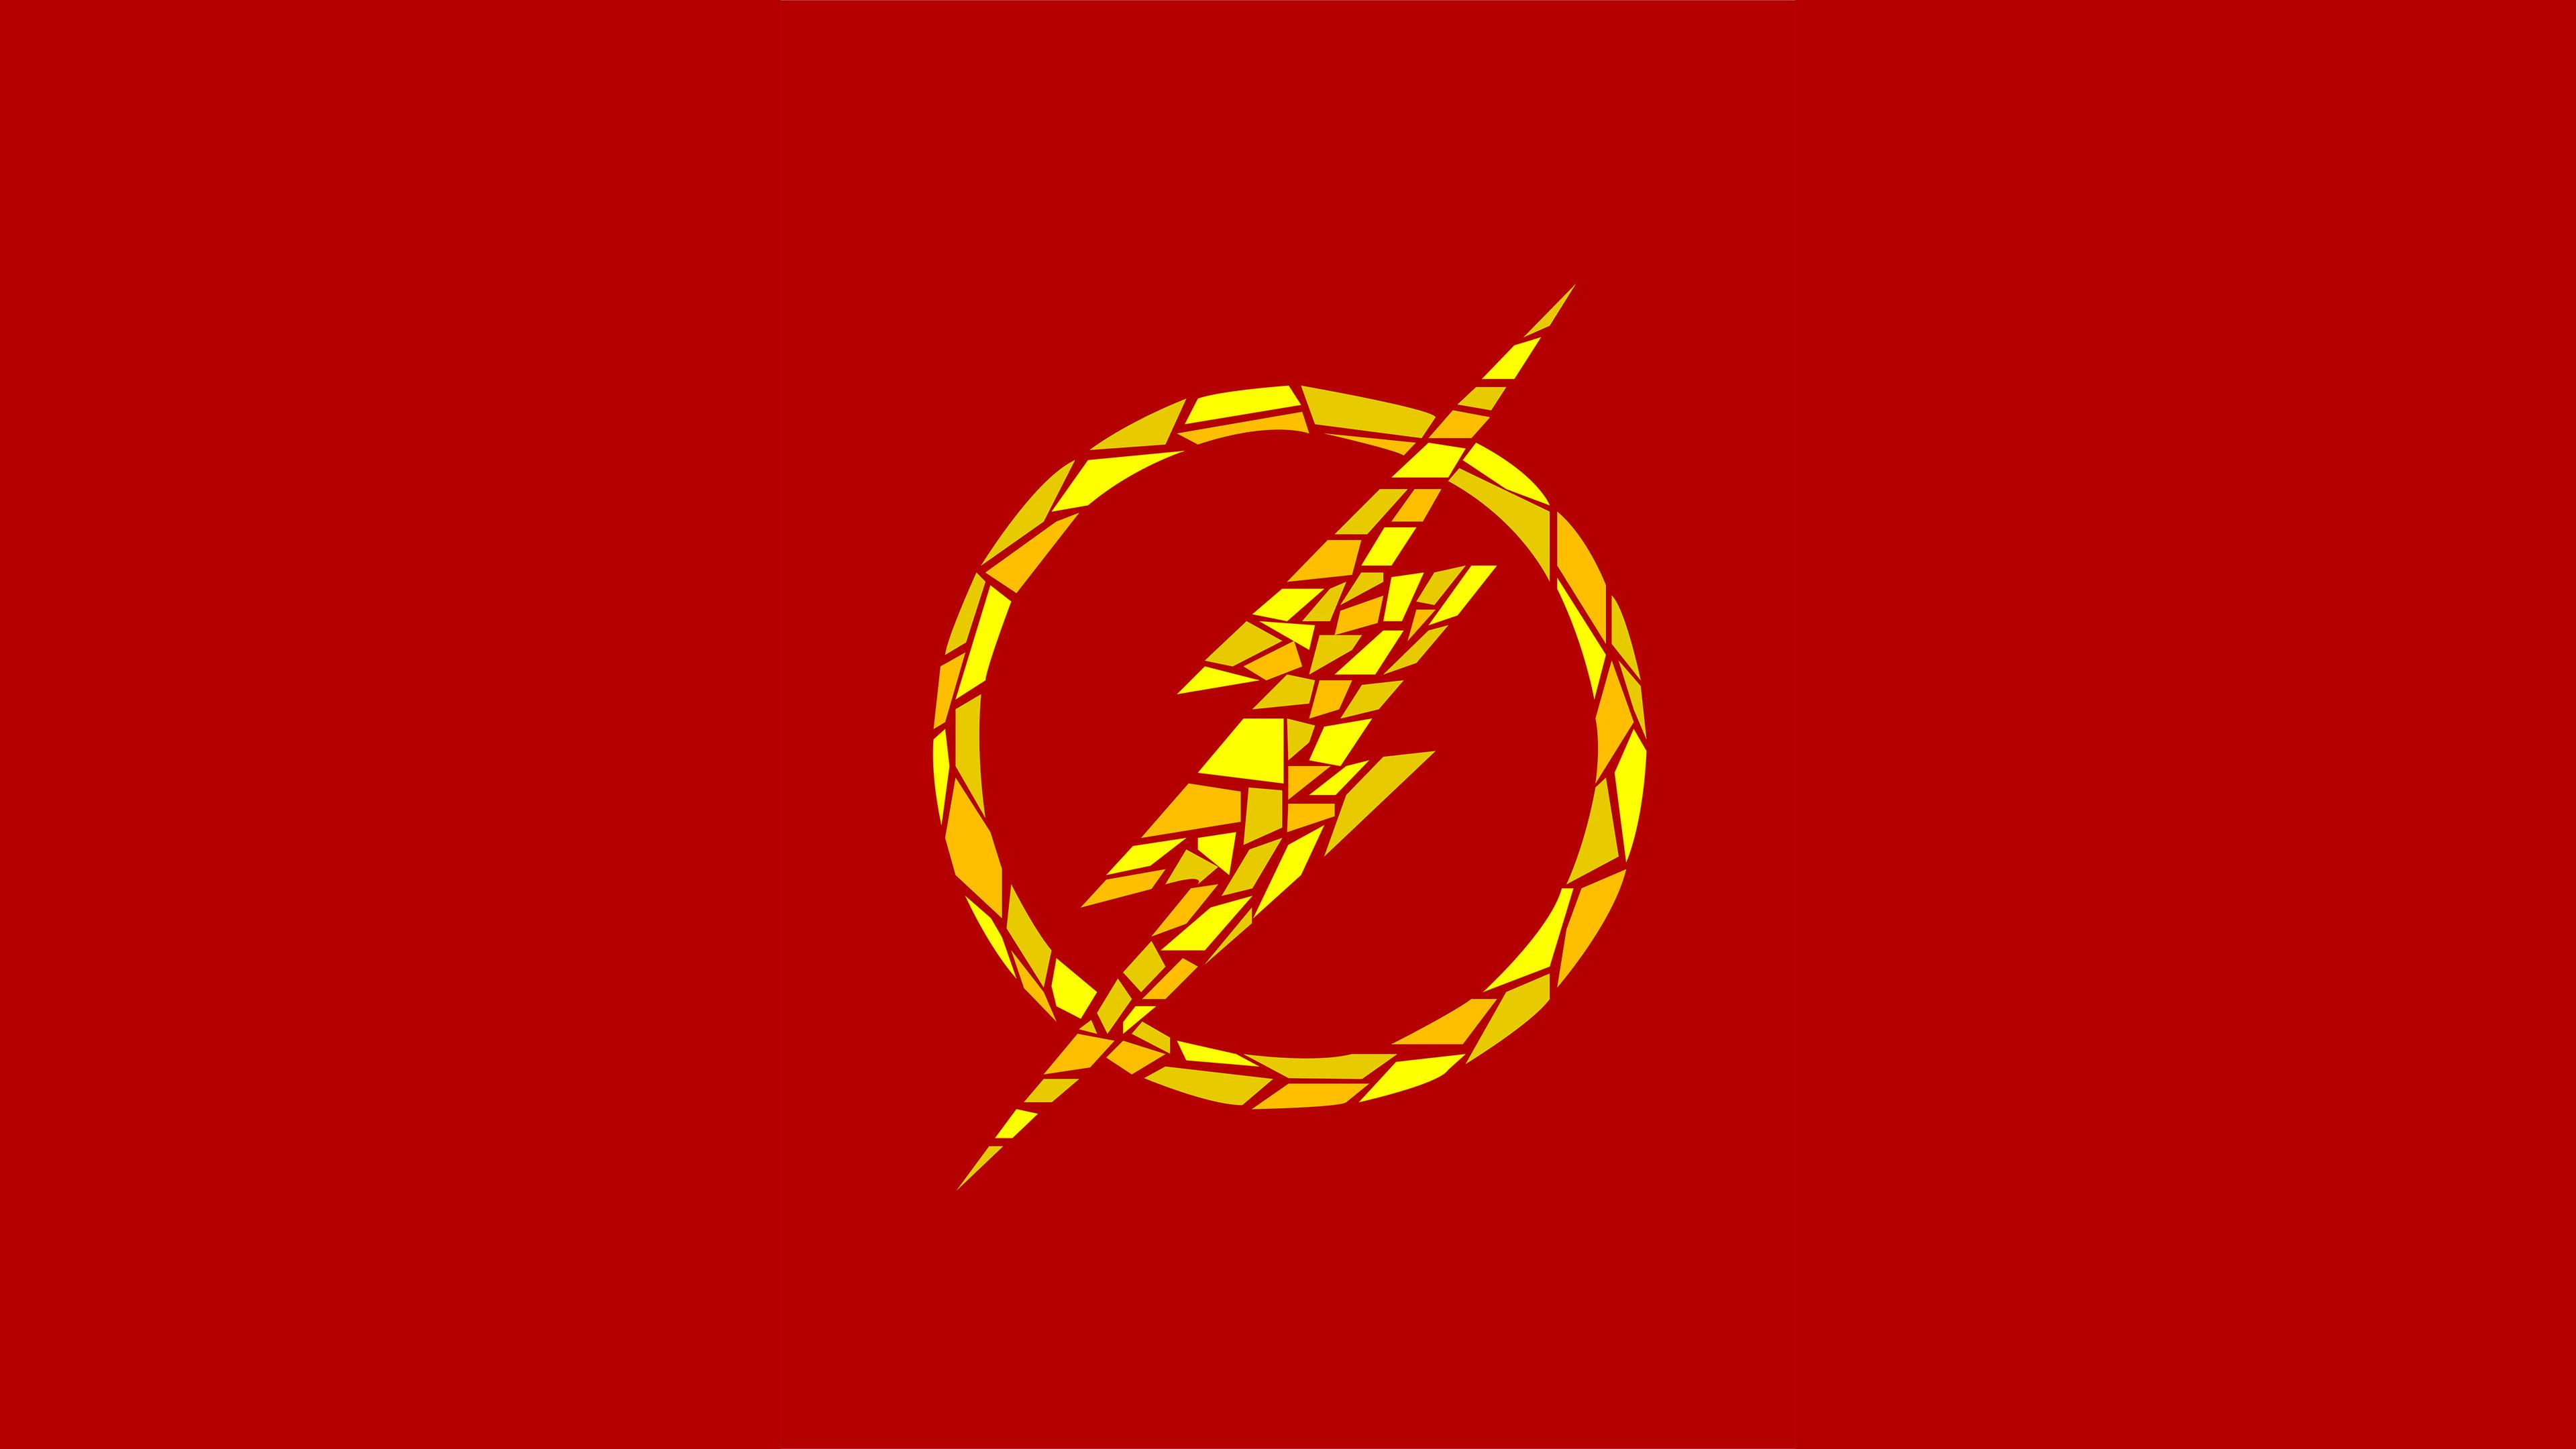 The Flash Logo Artwork